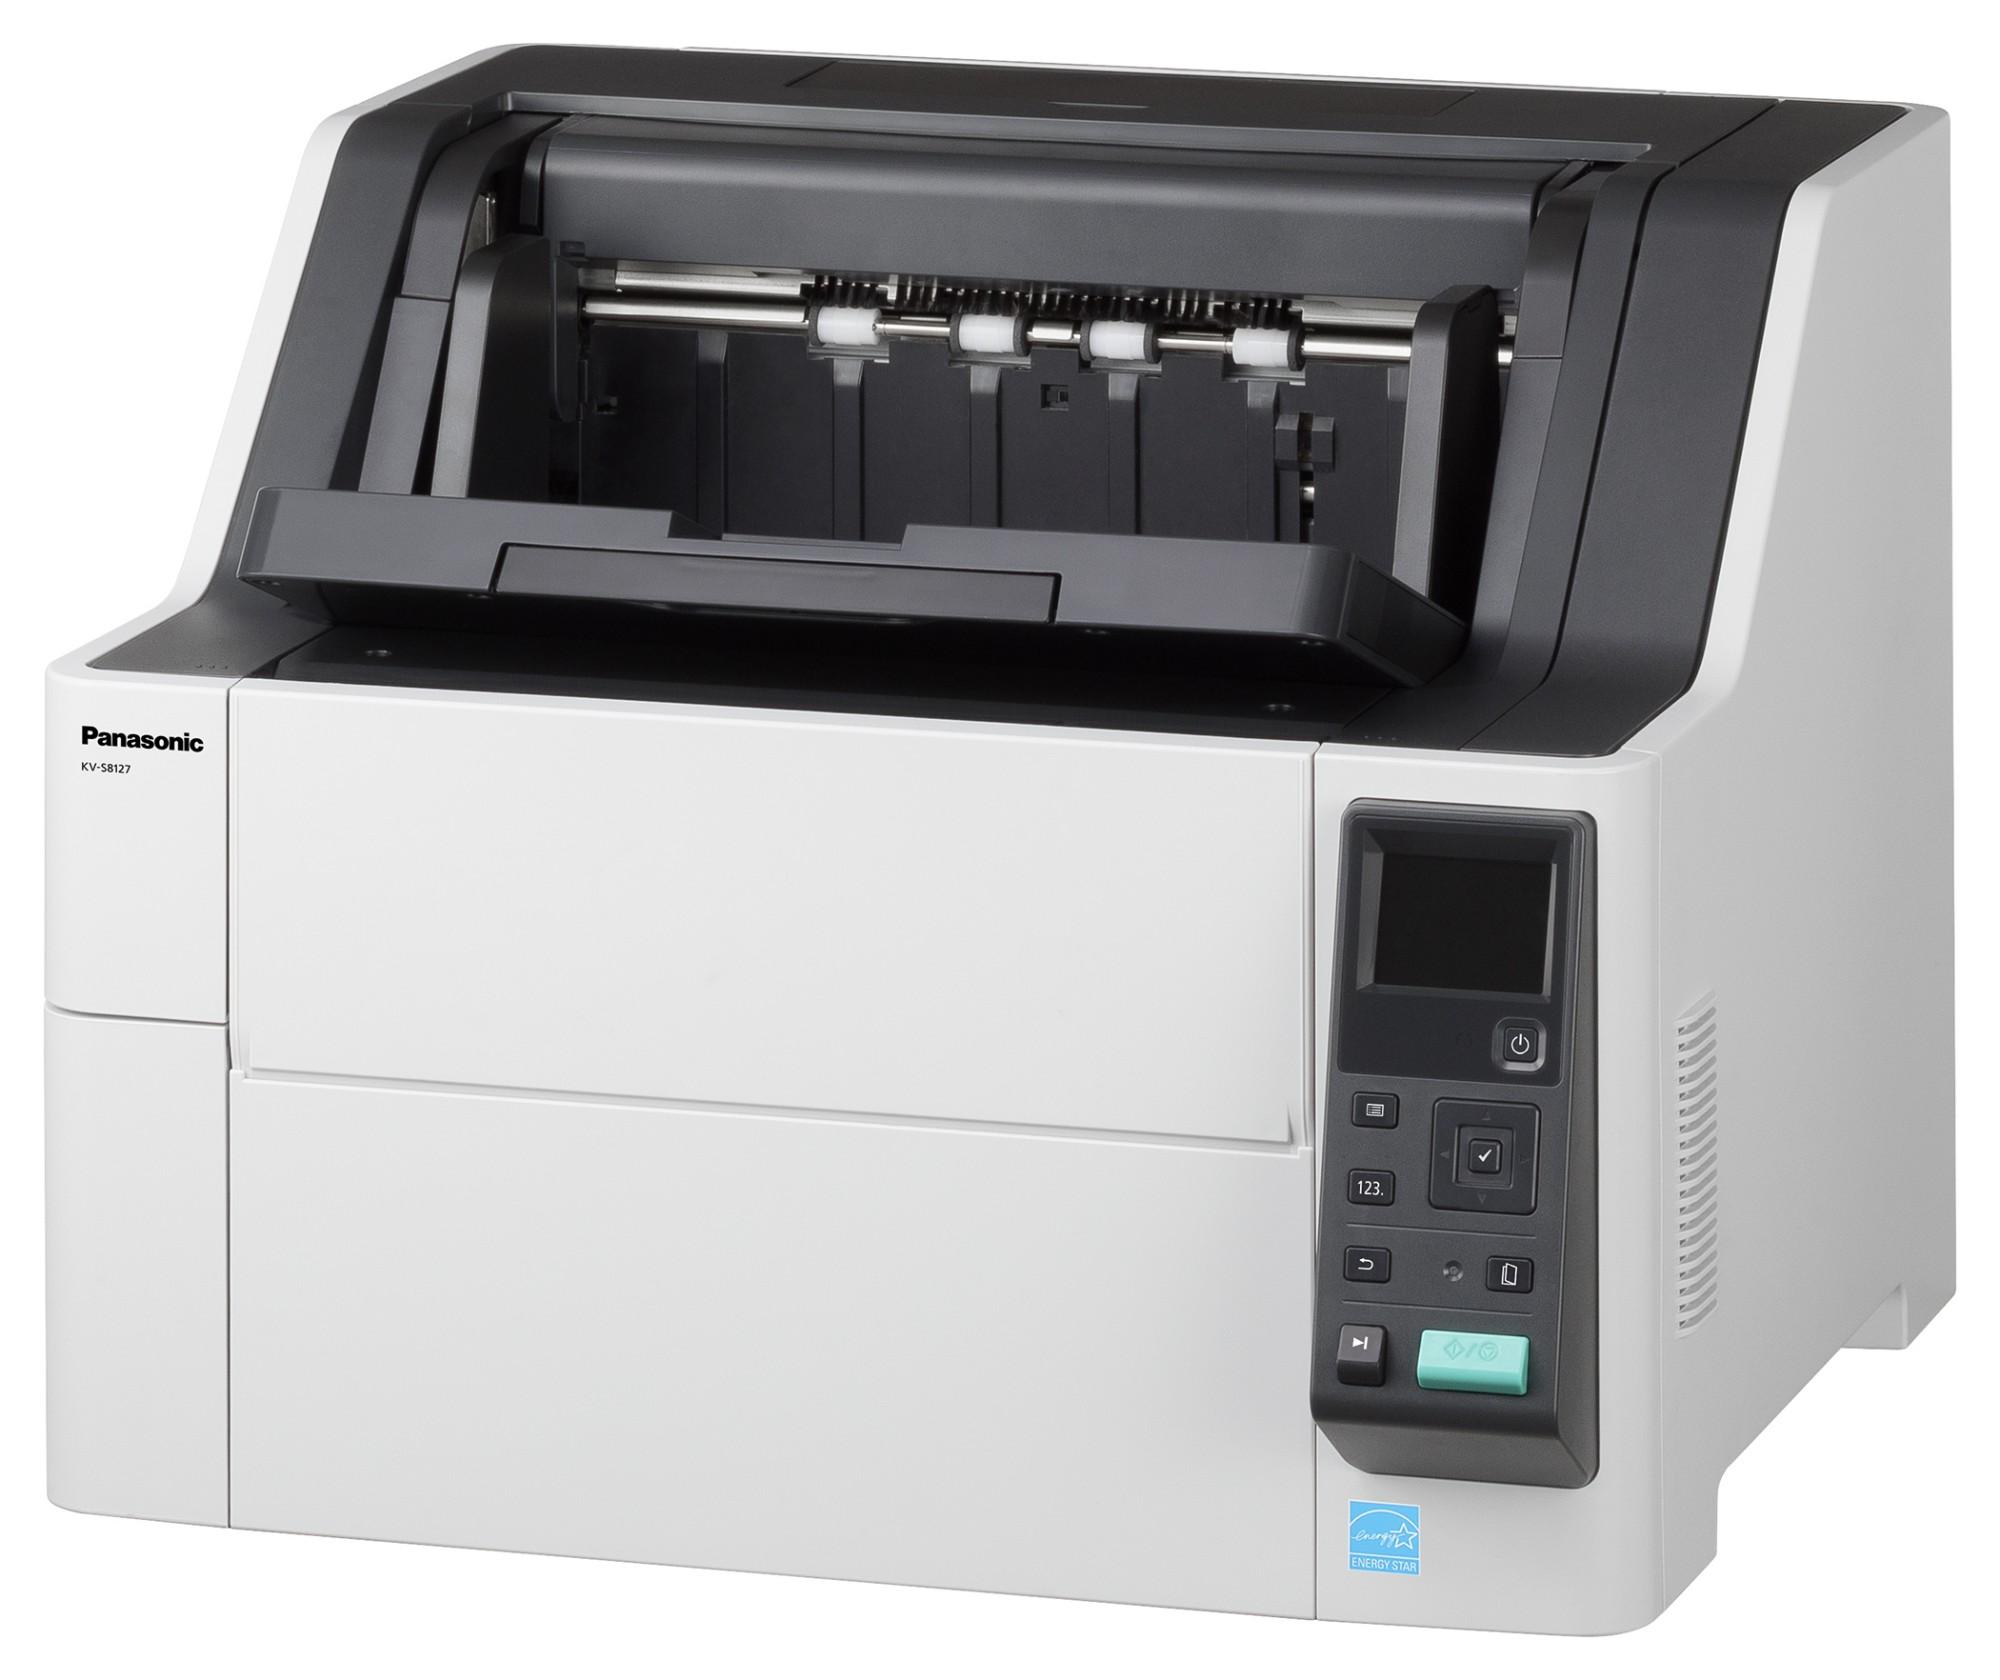 Panasonic KV-S8127 600 x 1200 DPI ADF scanner Black,White A3